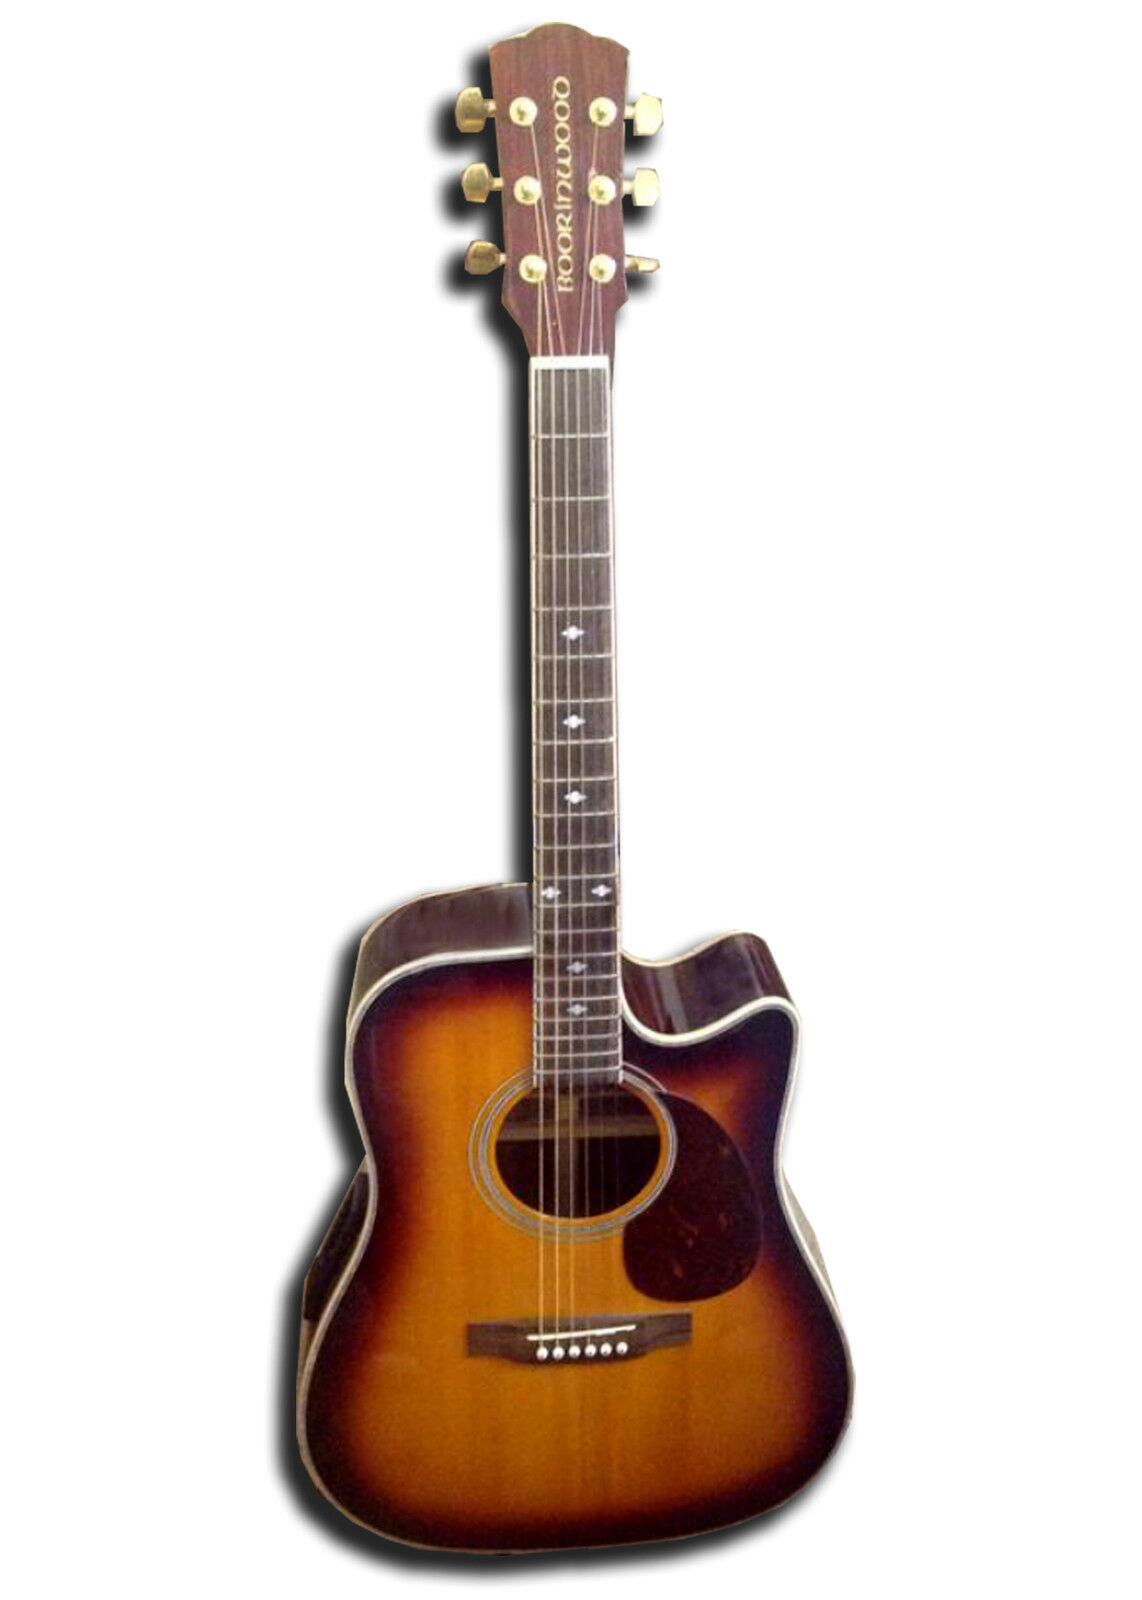 New Boorinwood SDC130SE Semi Acoustic Guitar Sunburst